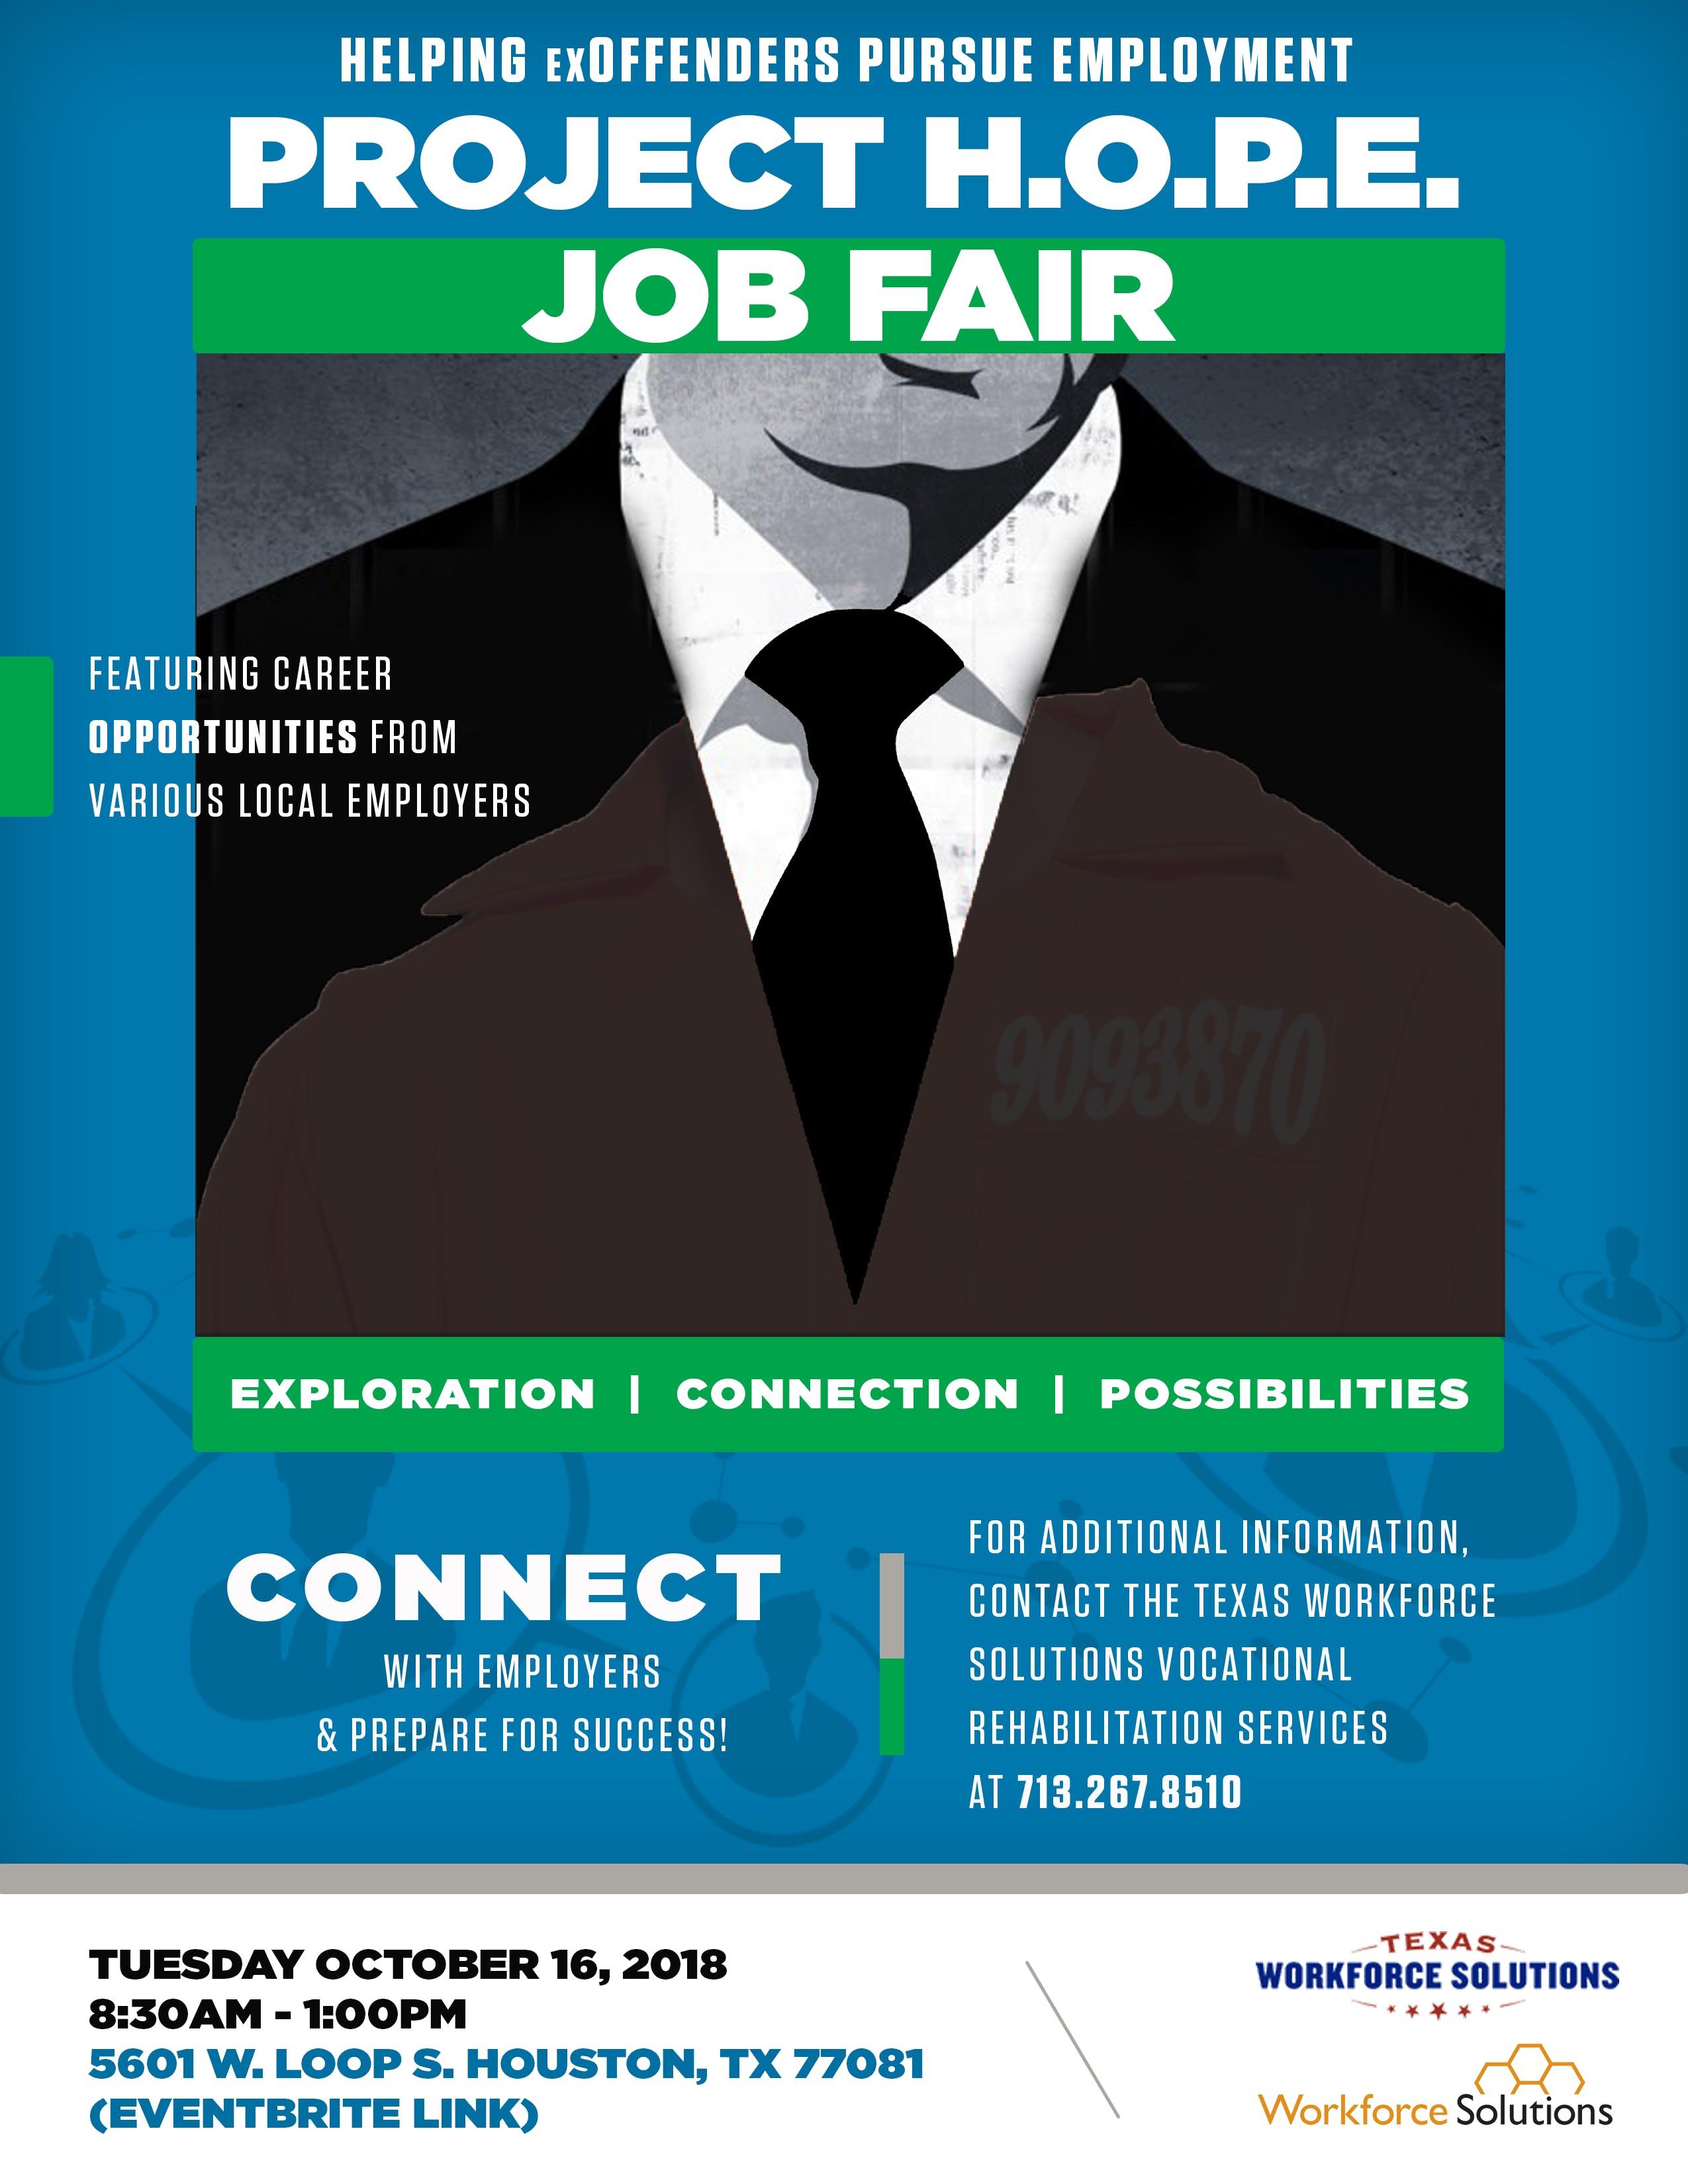 Project H O P E Helping Ex Offenders Pursue Employment Job Fair